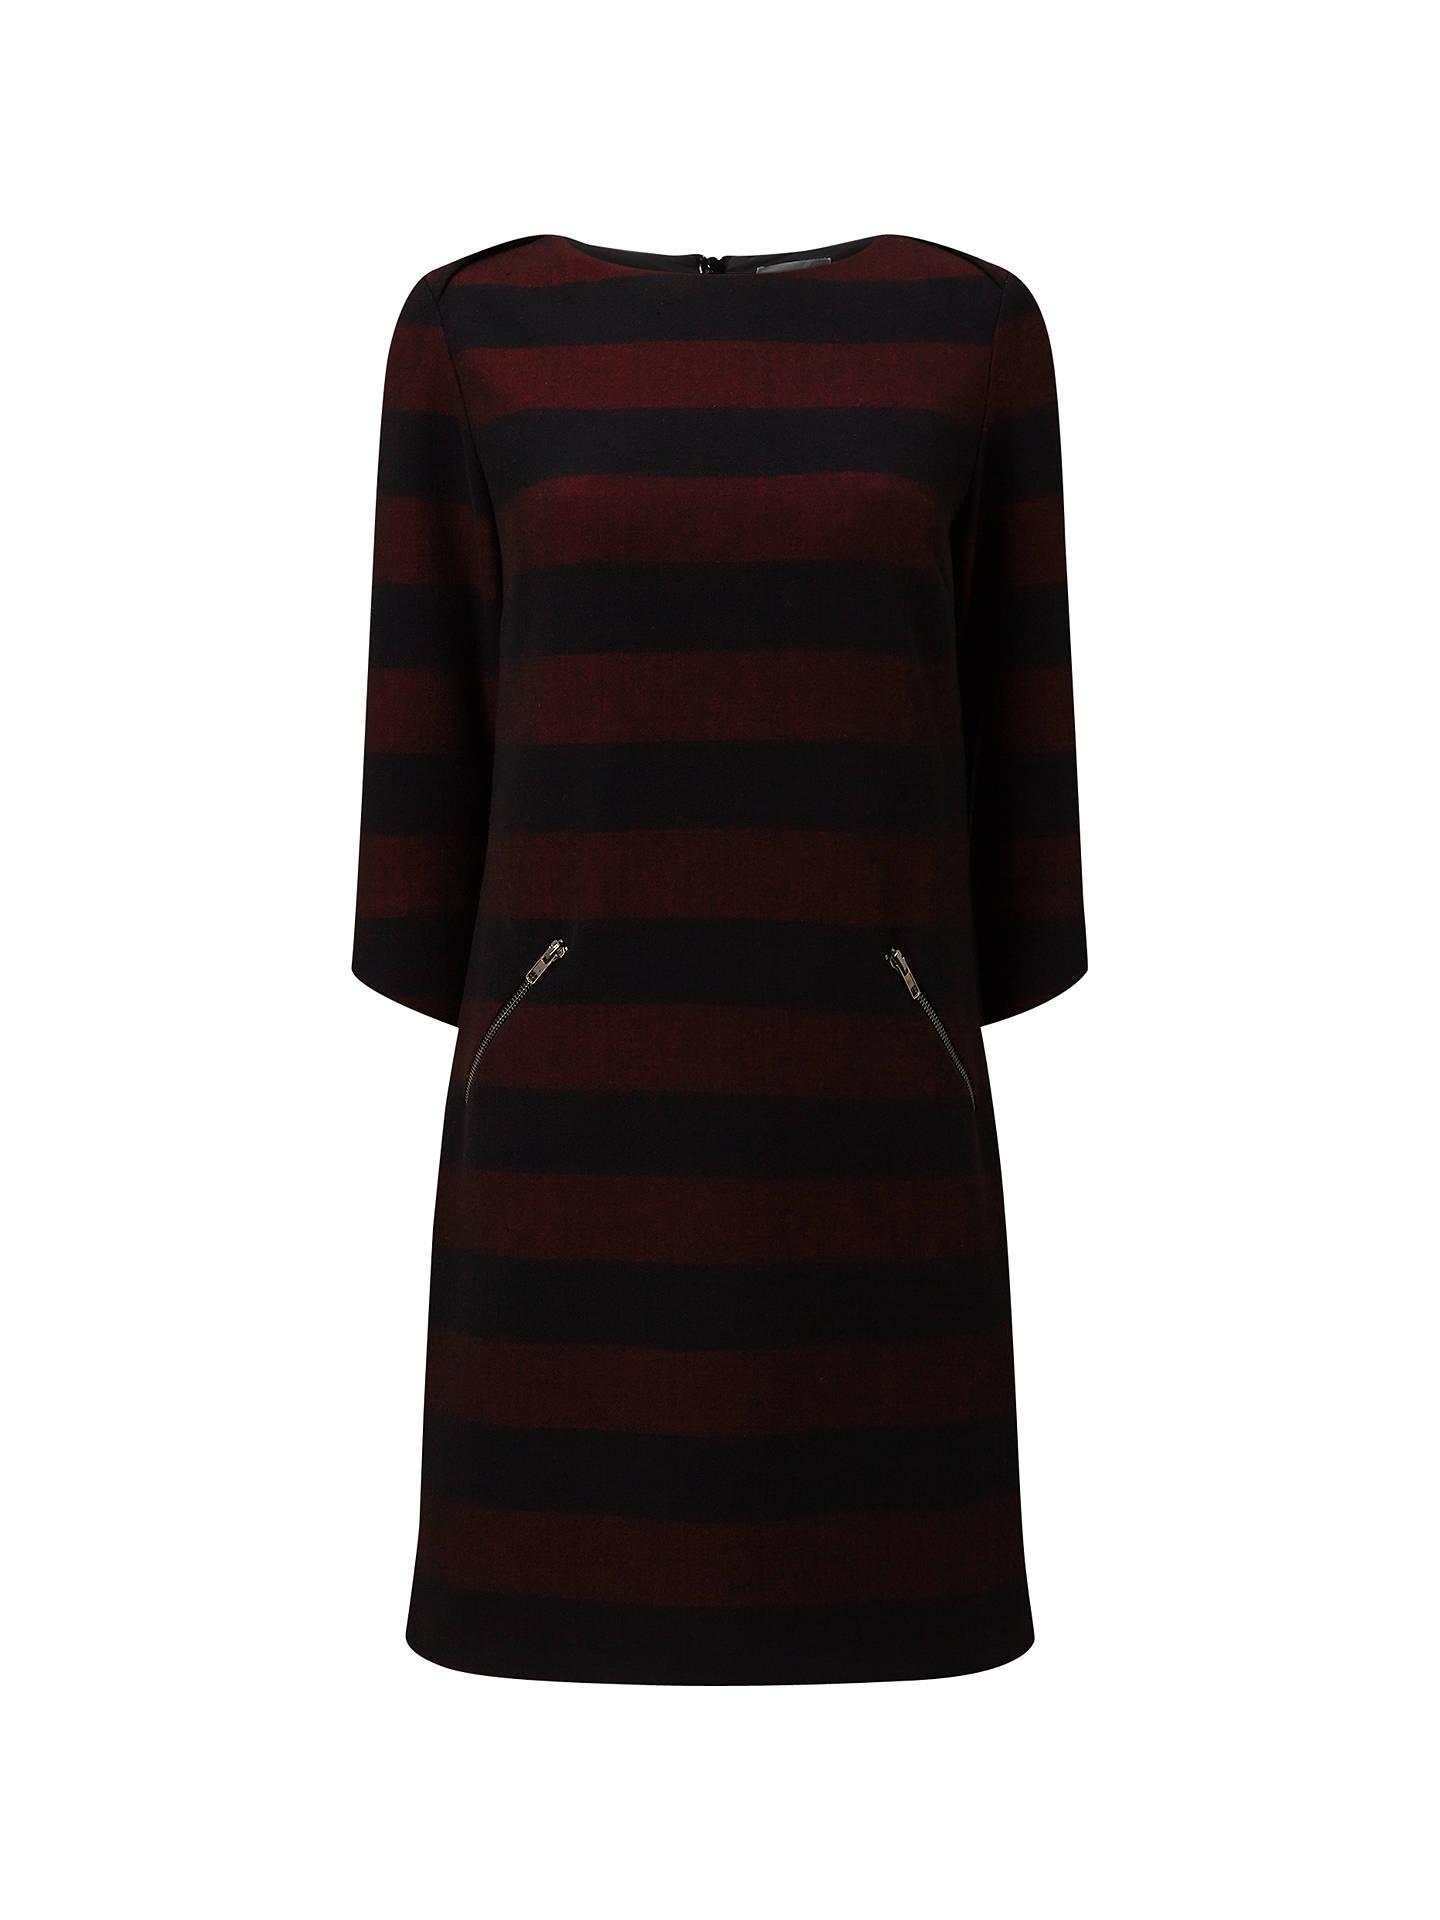 Phase Eight Sienna Tunic Dress, Aubergine/Black at John Lewis & Partners